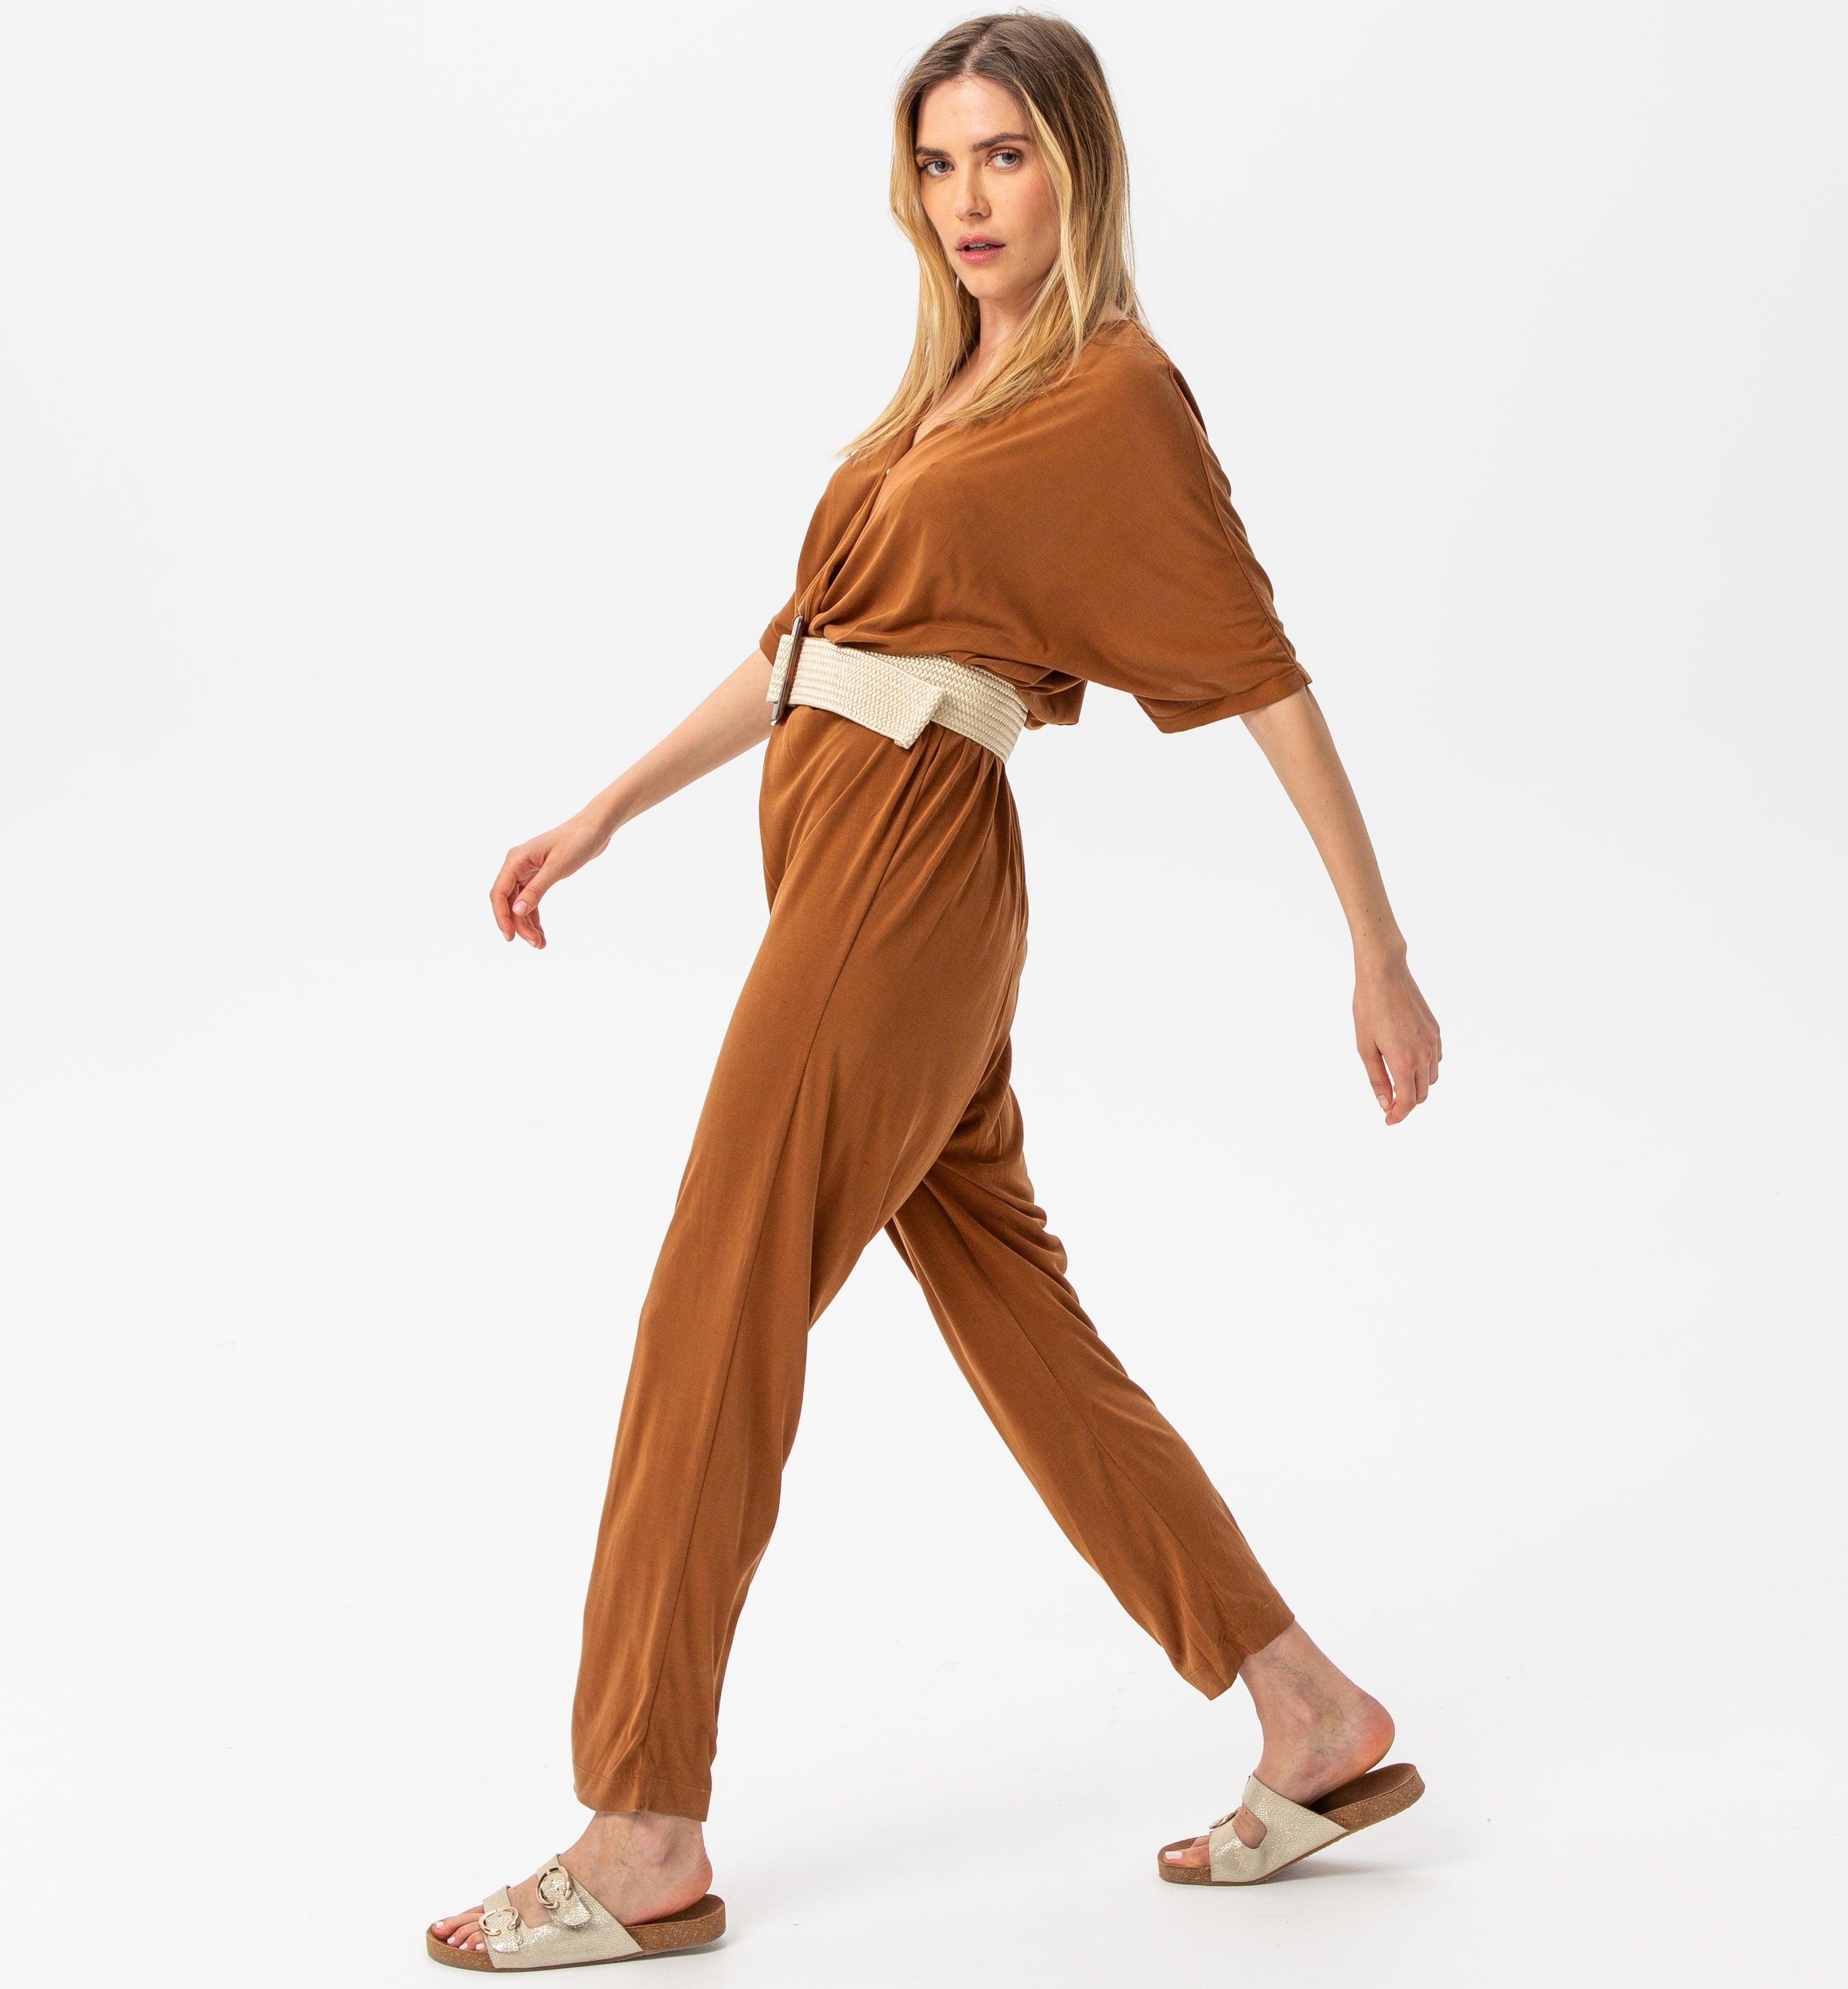 Combinaison-pantalon unie